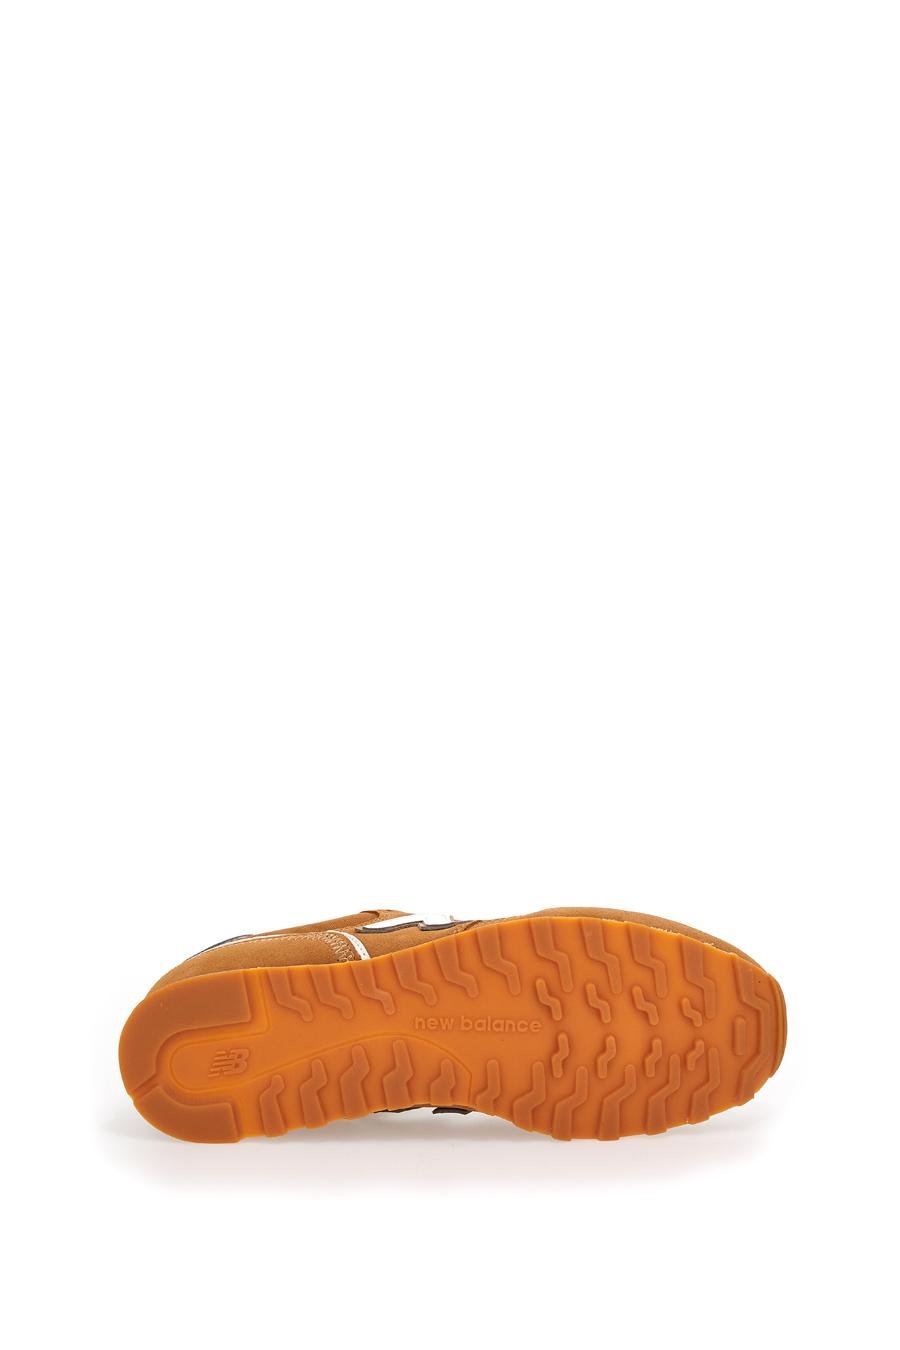 SNEAKERS uomo marrone NEW BALANCE 373SM2 | Pittarello